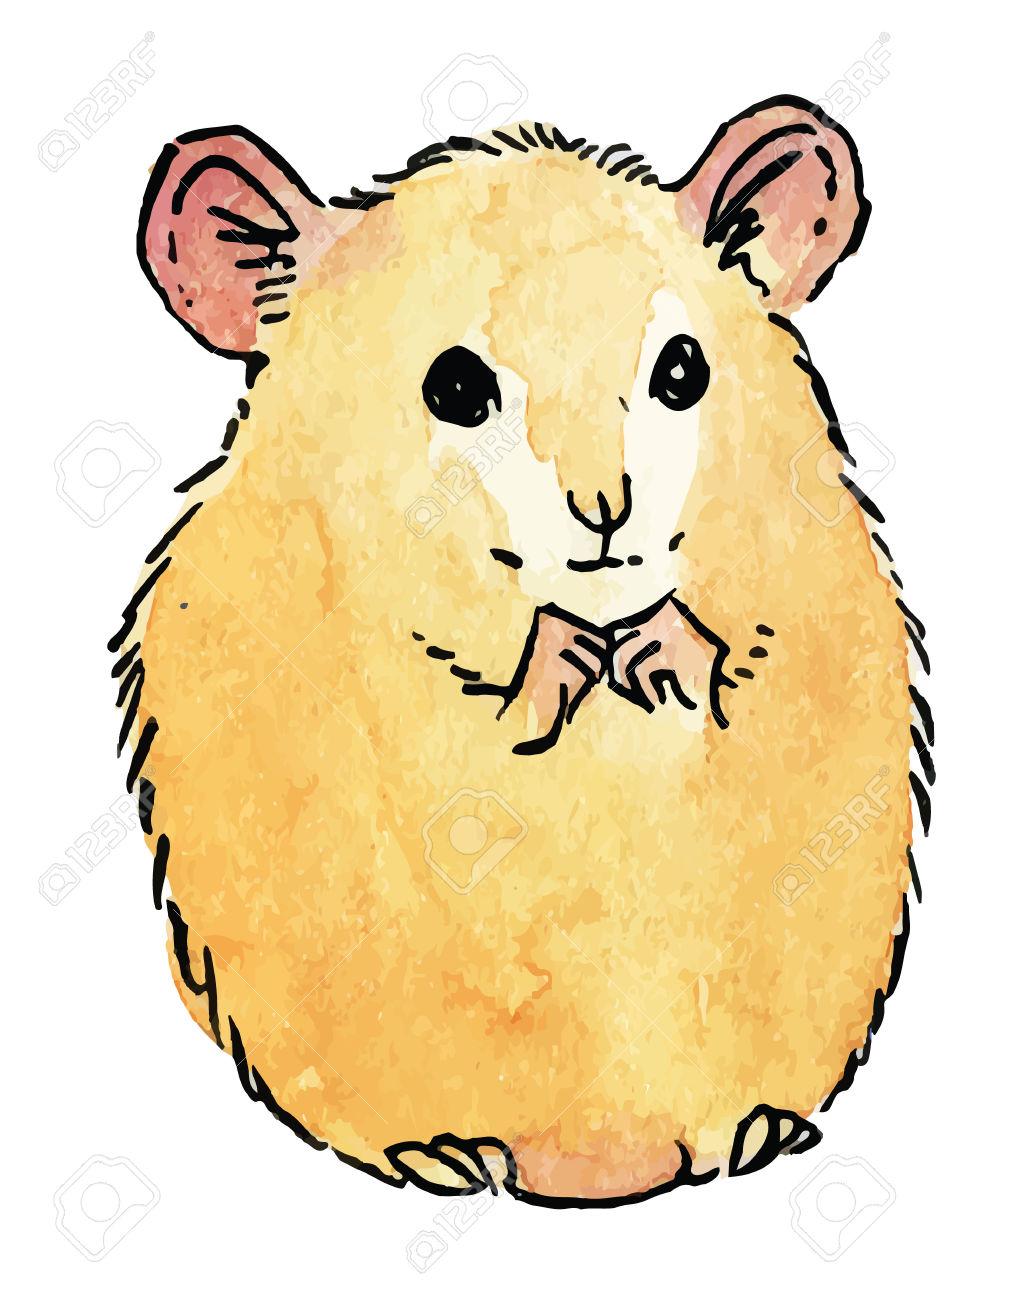 Hamster clipart Clipart hamster #4 Clipart hamster